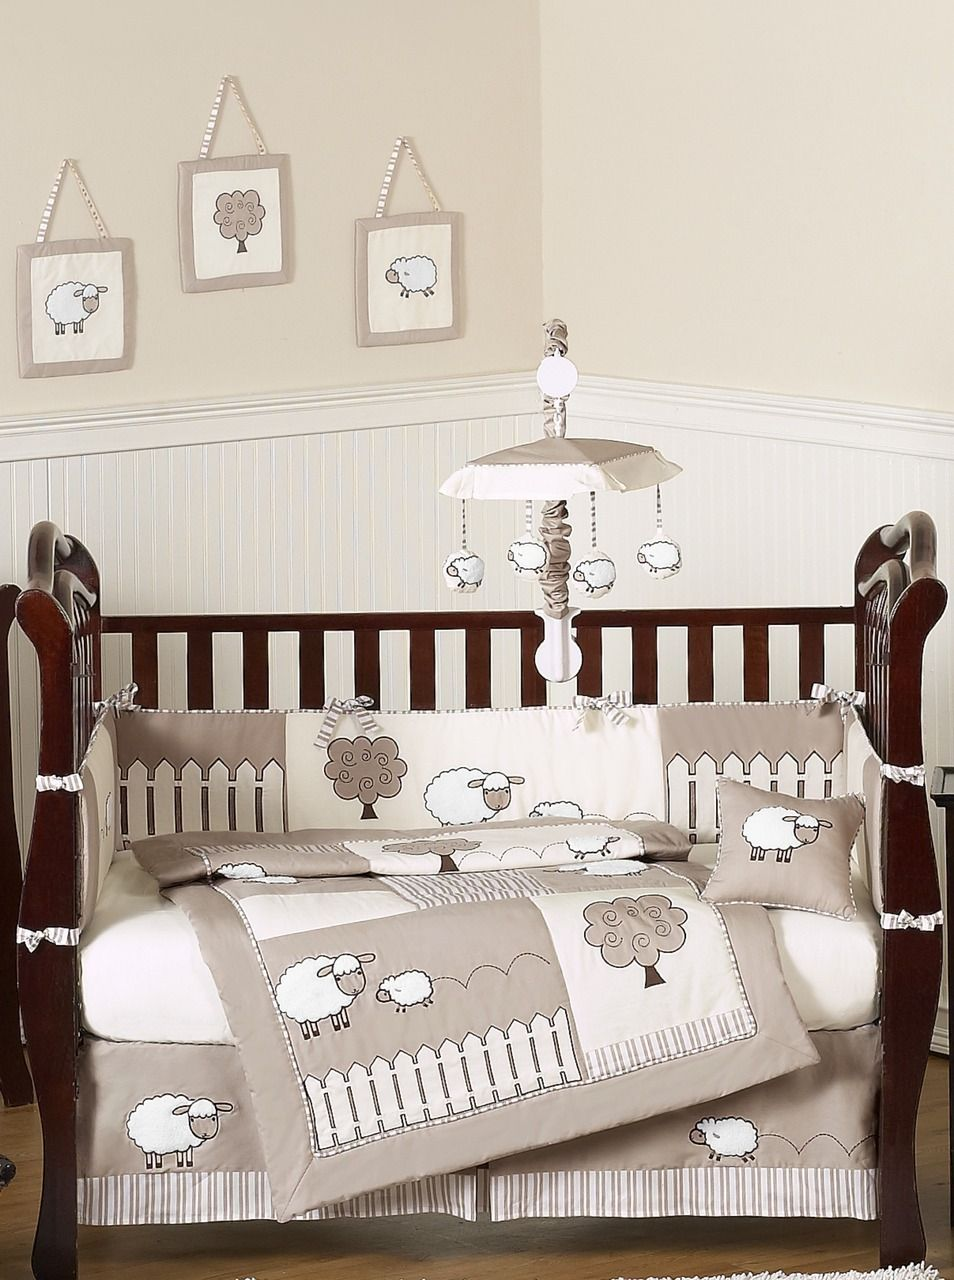 Little Lamb Baby Bedding 9pc Neutral Crib Set By Sweet Jojo Designs Baby Bedding Sets Nursery Bedding Sets Lamb Nursery